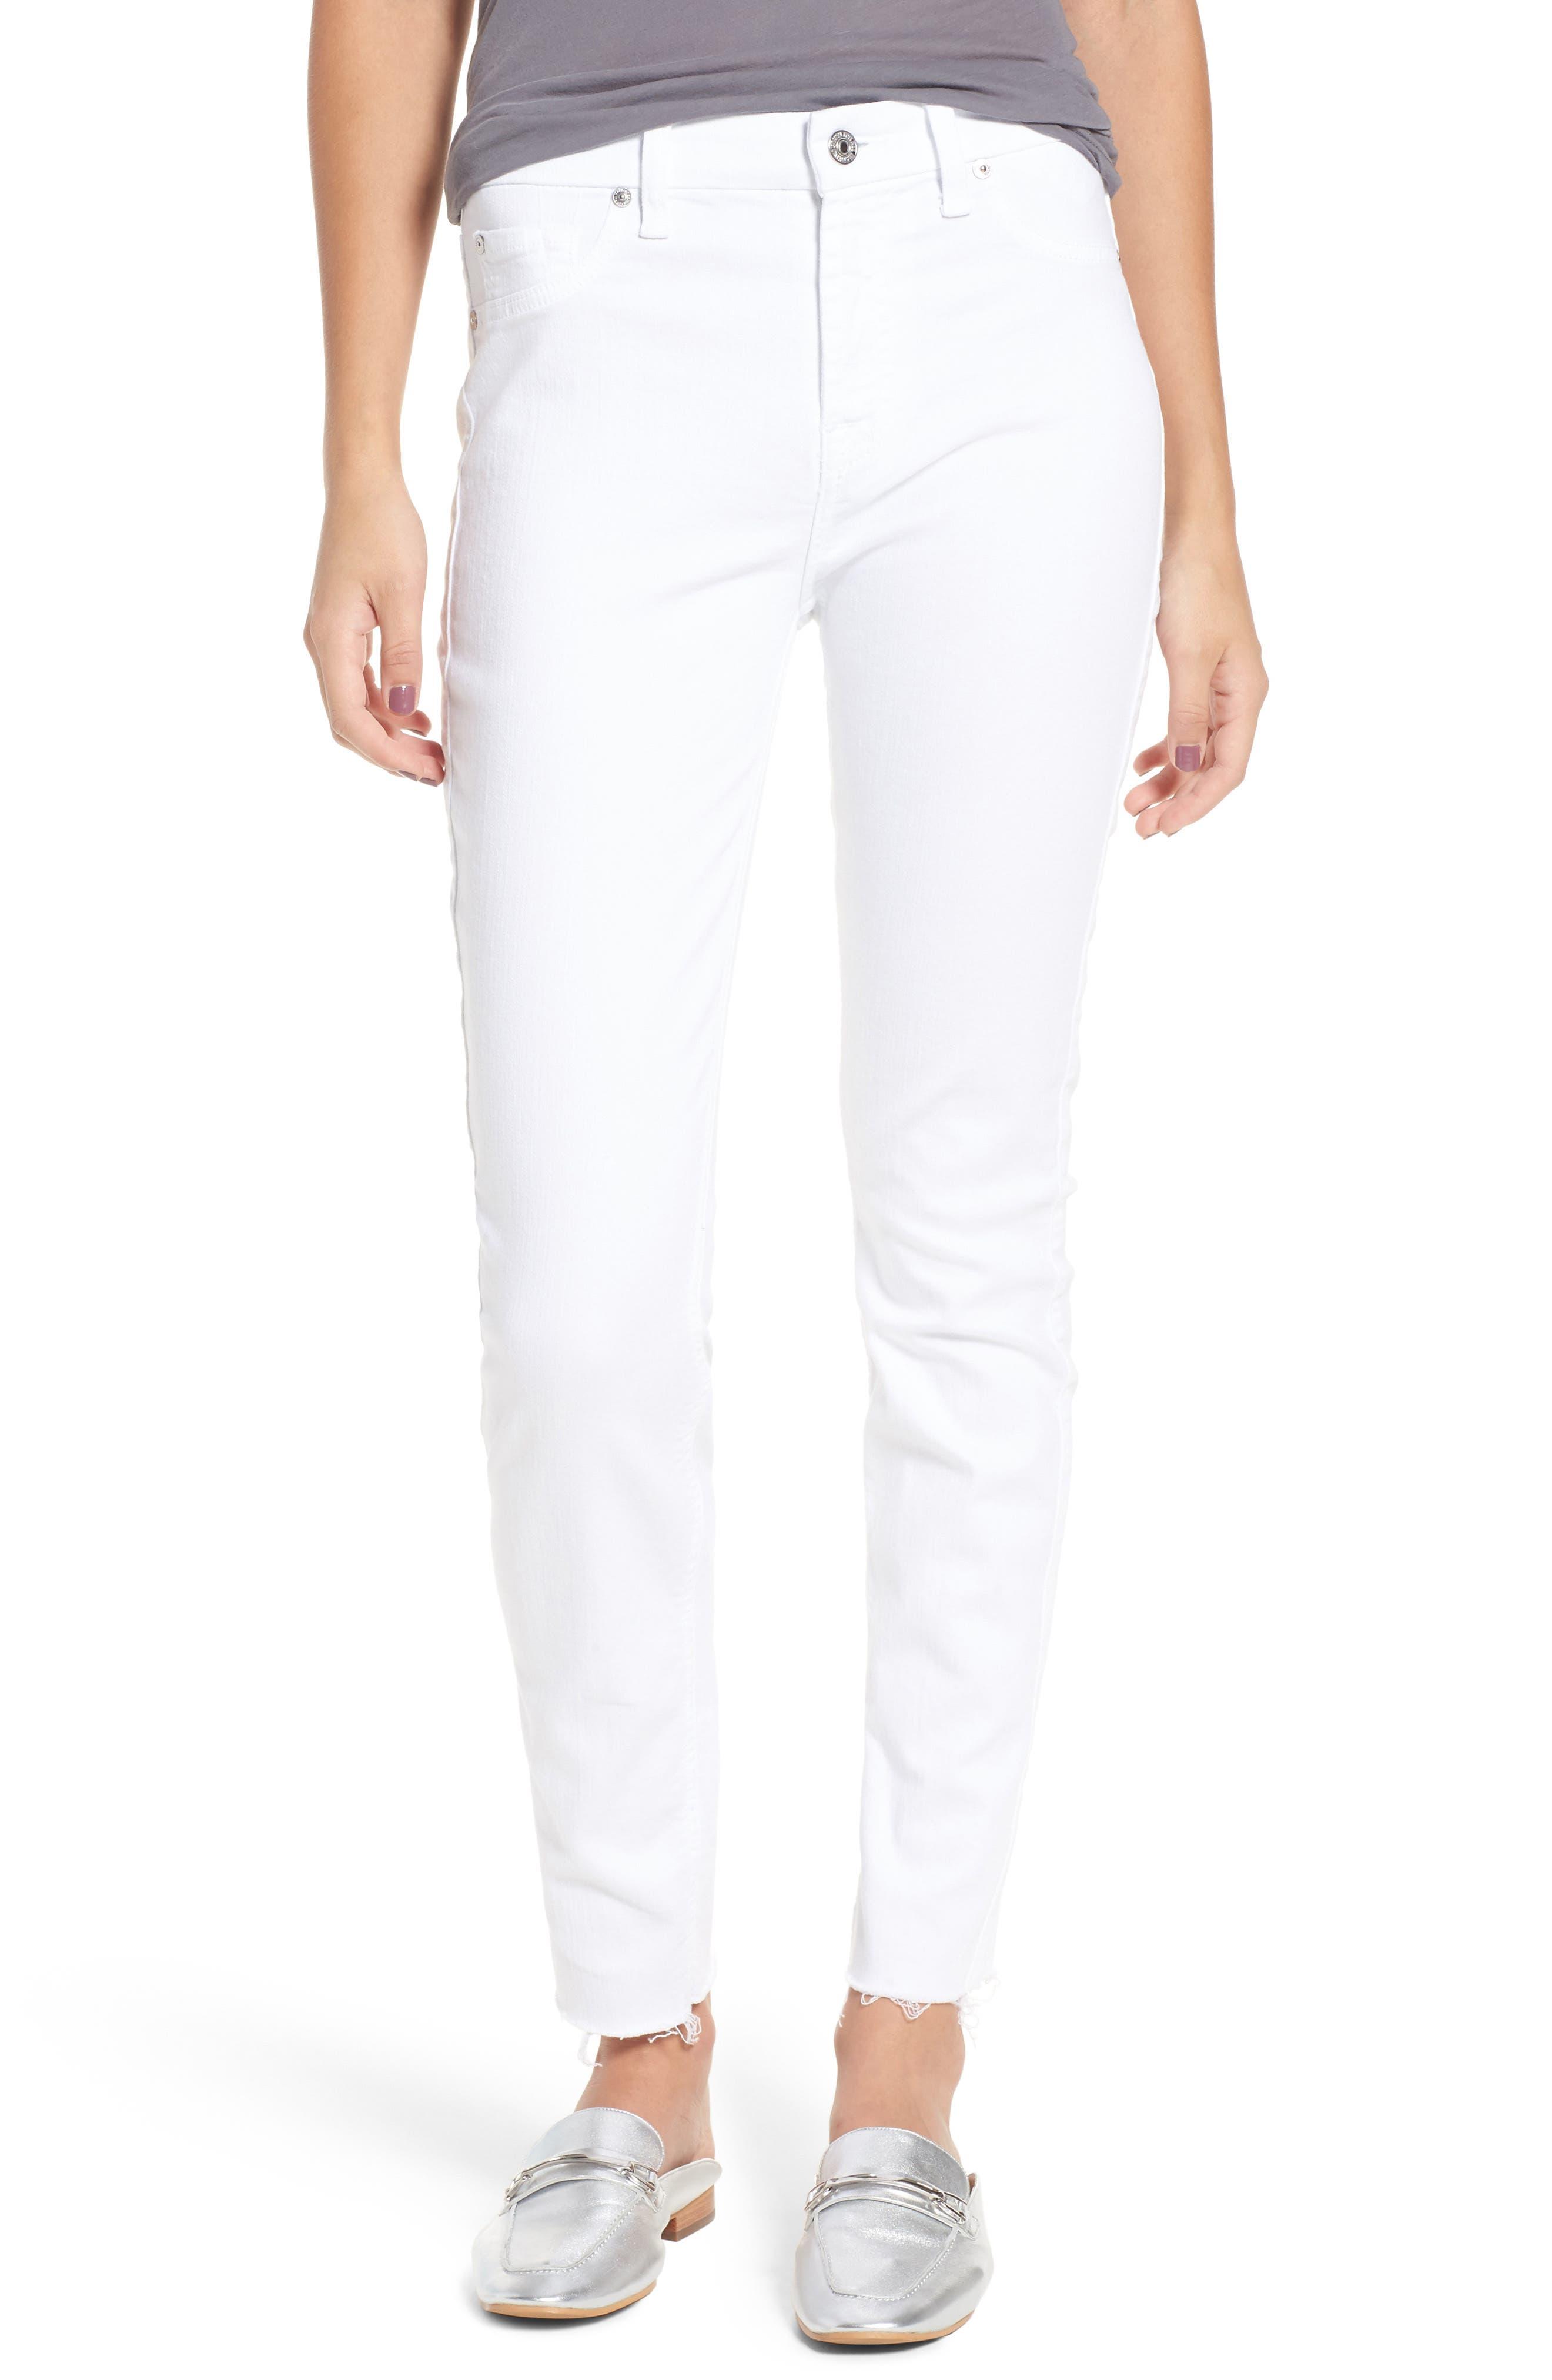 Women's 7 For All Mankind Raw Hem Skinny Jeans